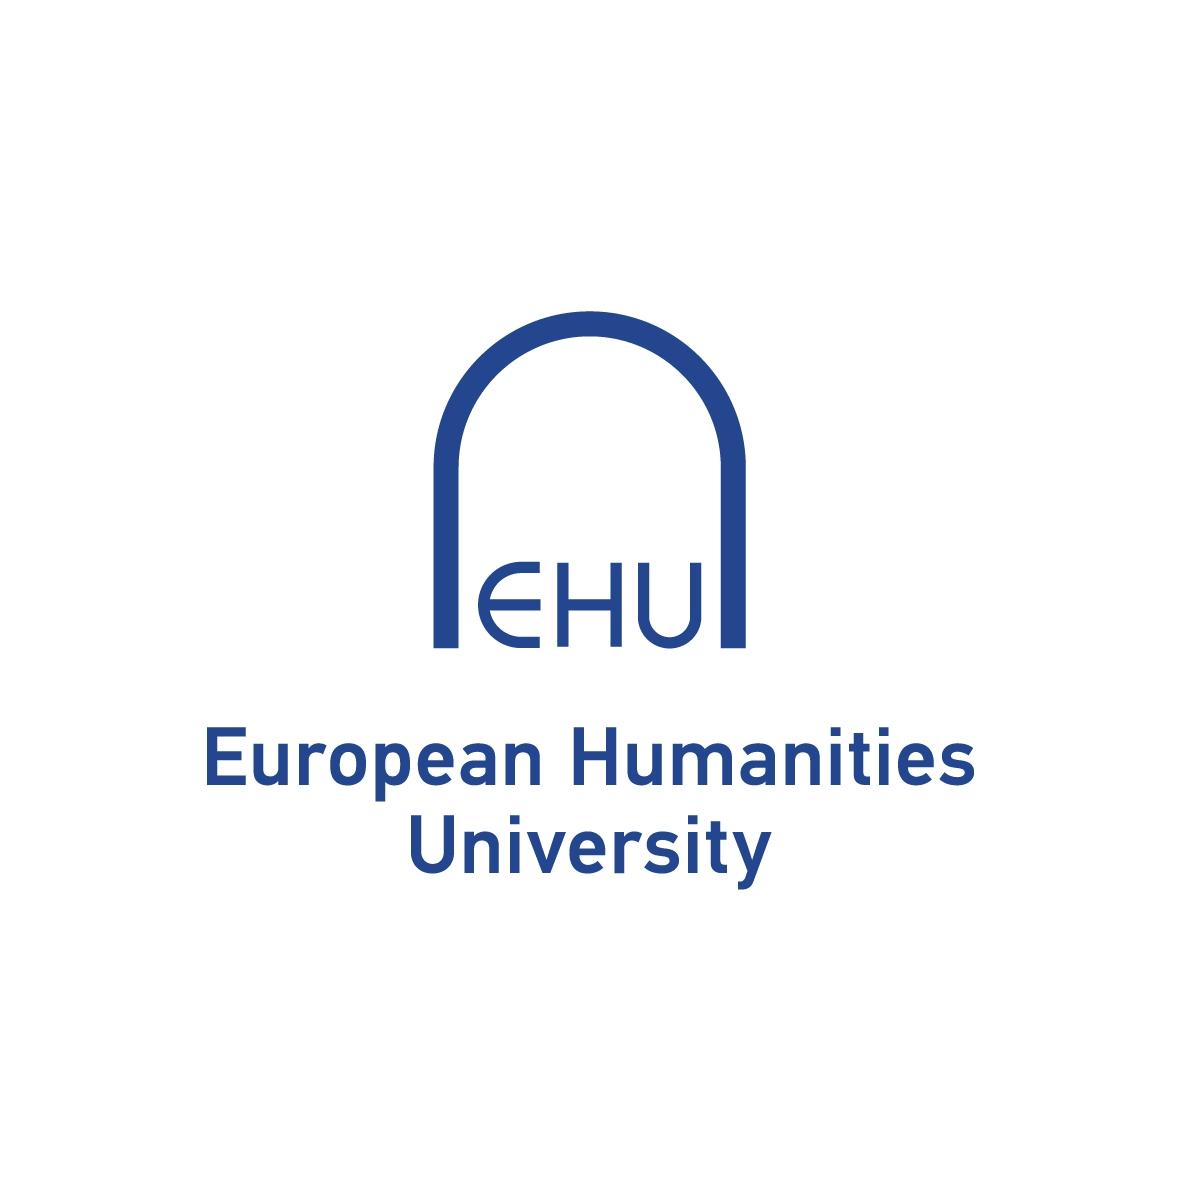 European Humanities University